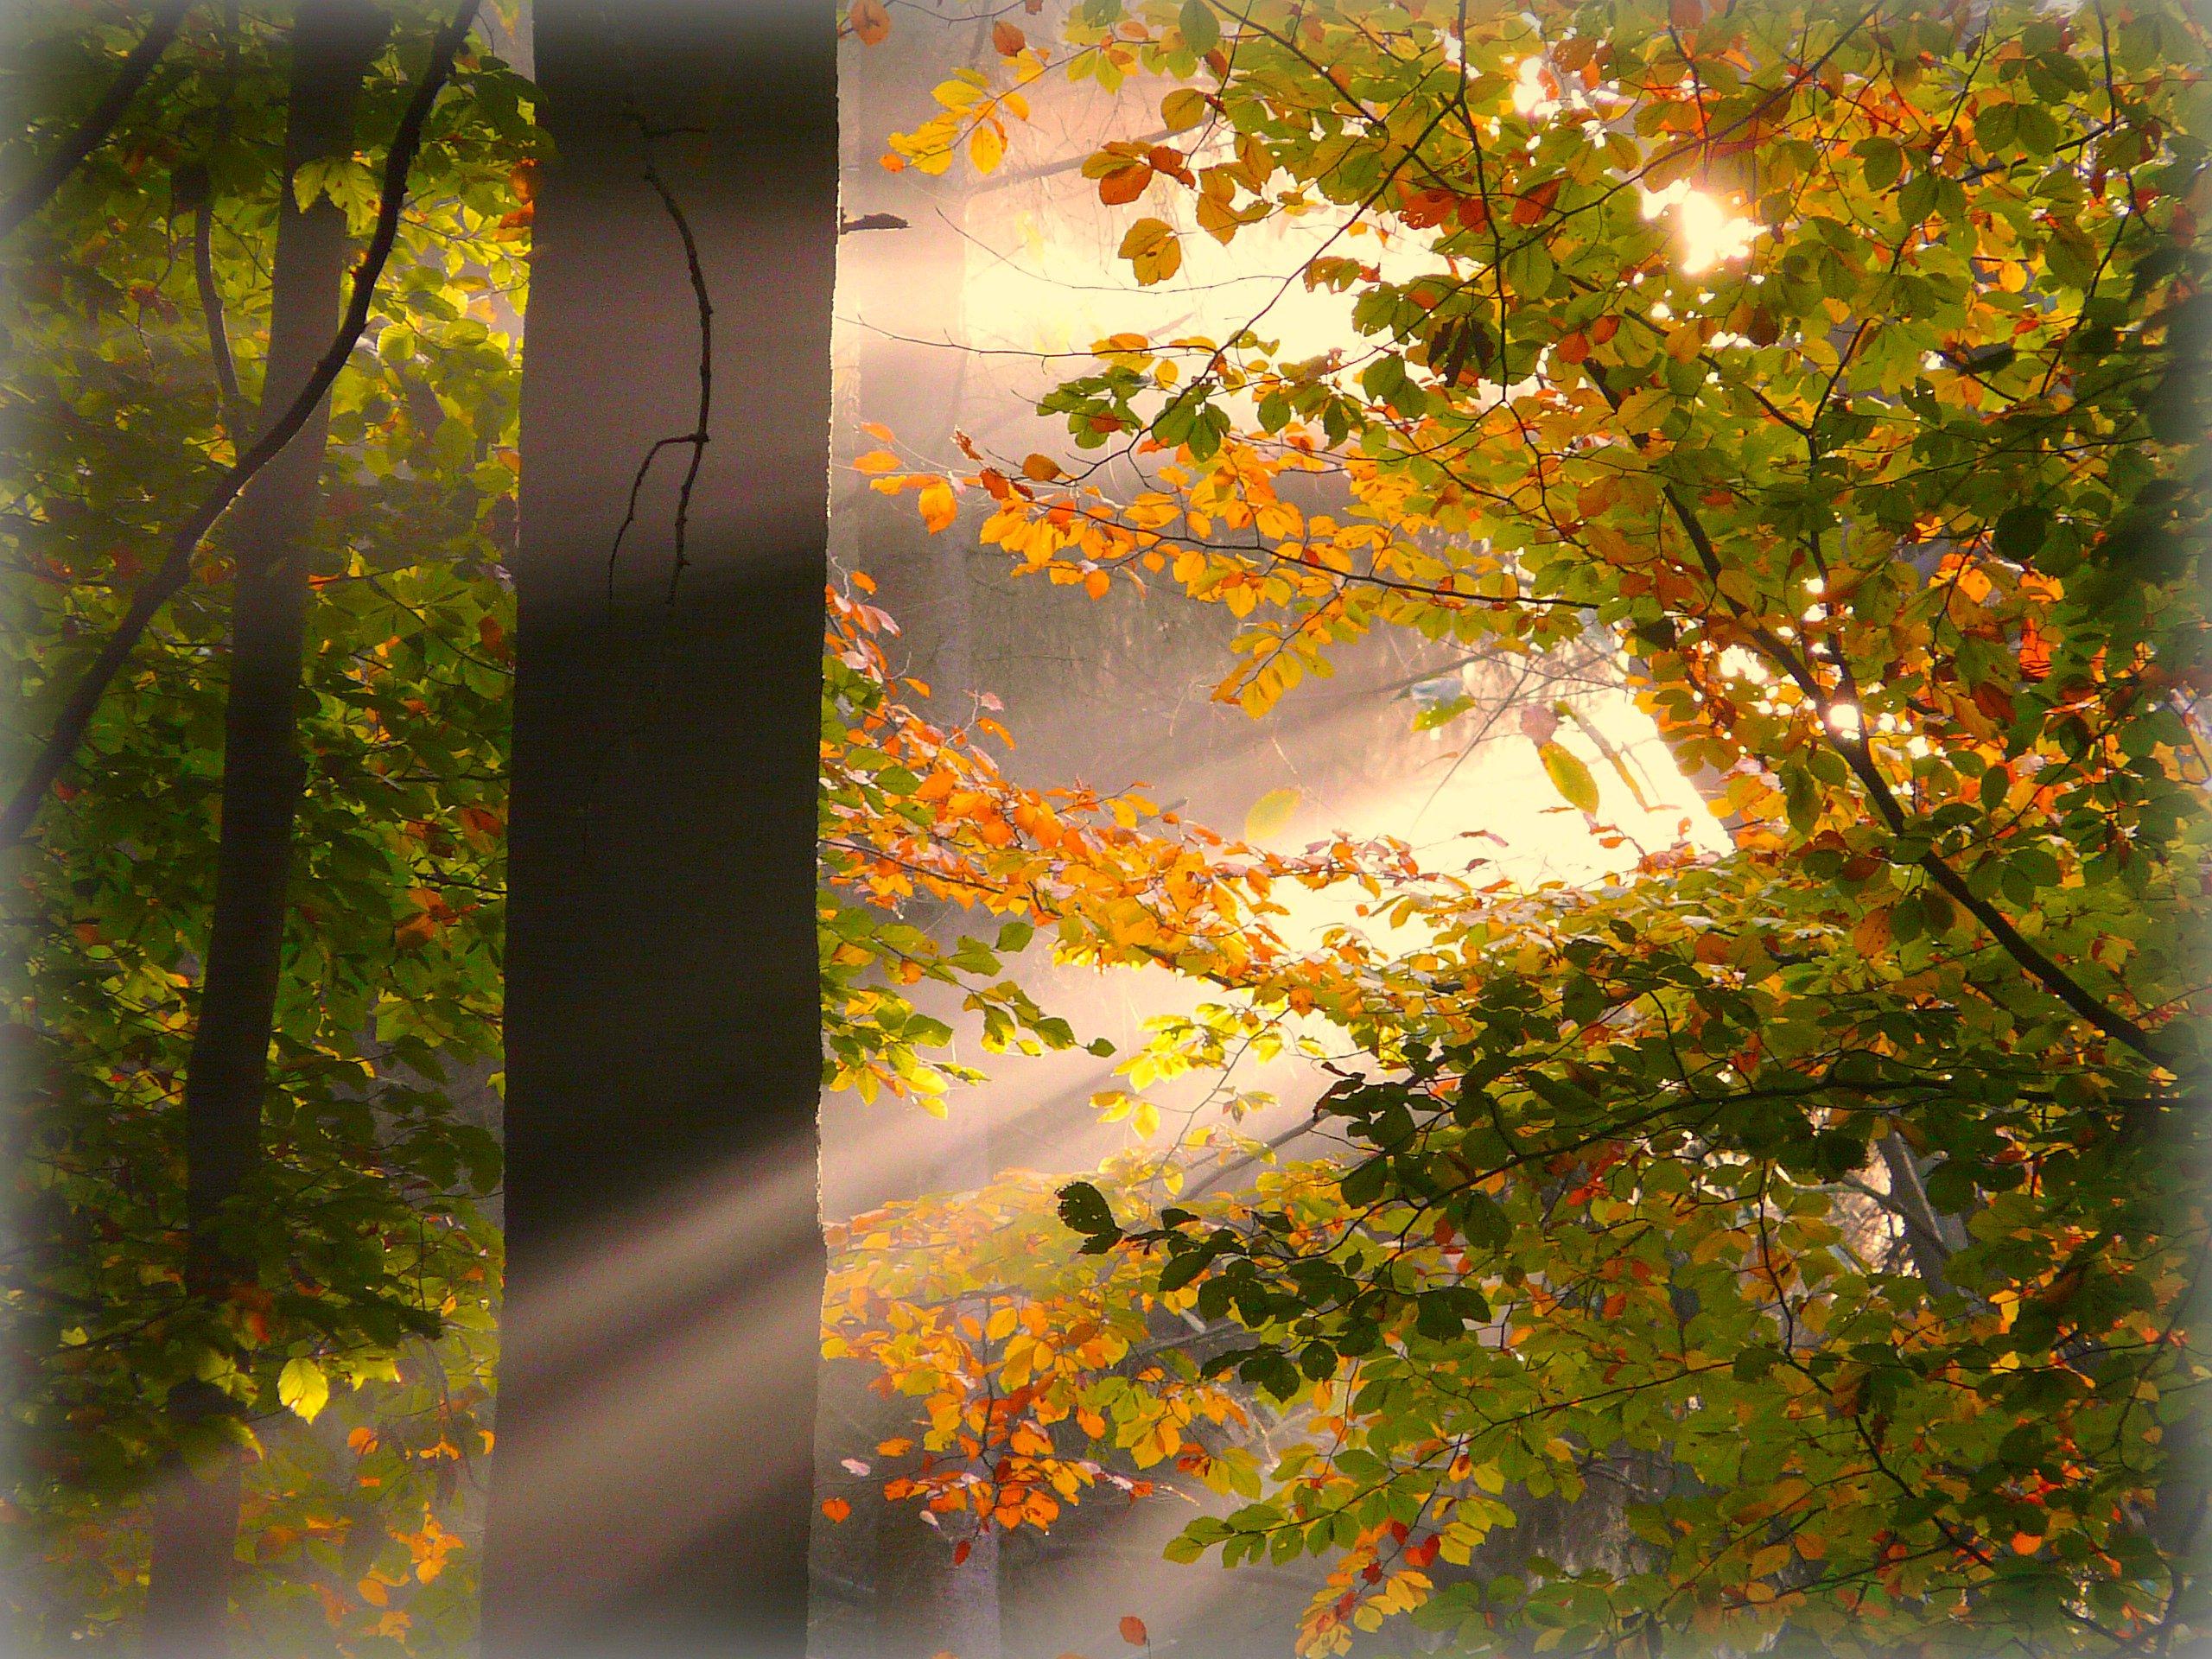 Holz Siegburg hintergrundbilder holz morgen sonne baum kunst fallen natur